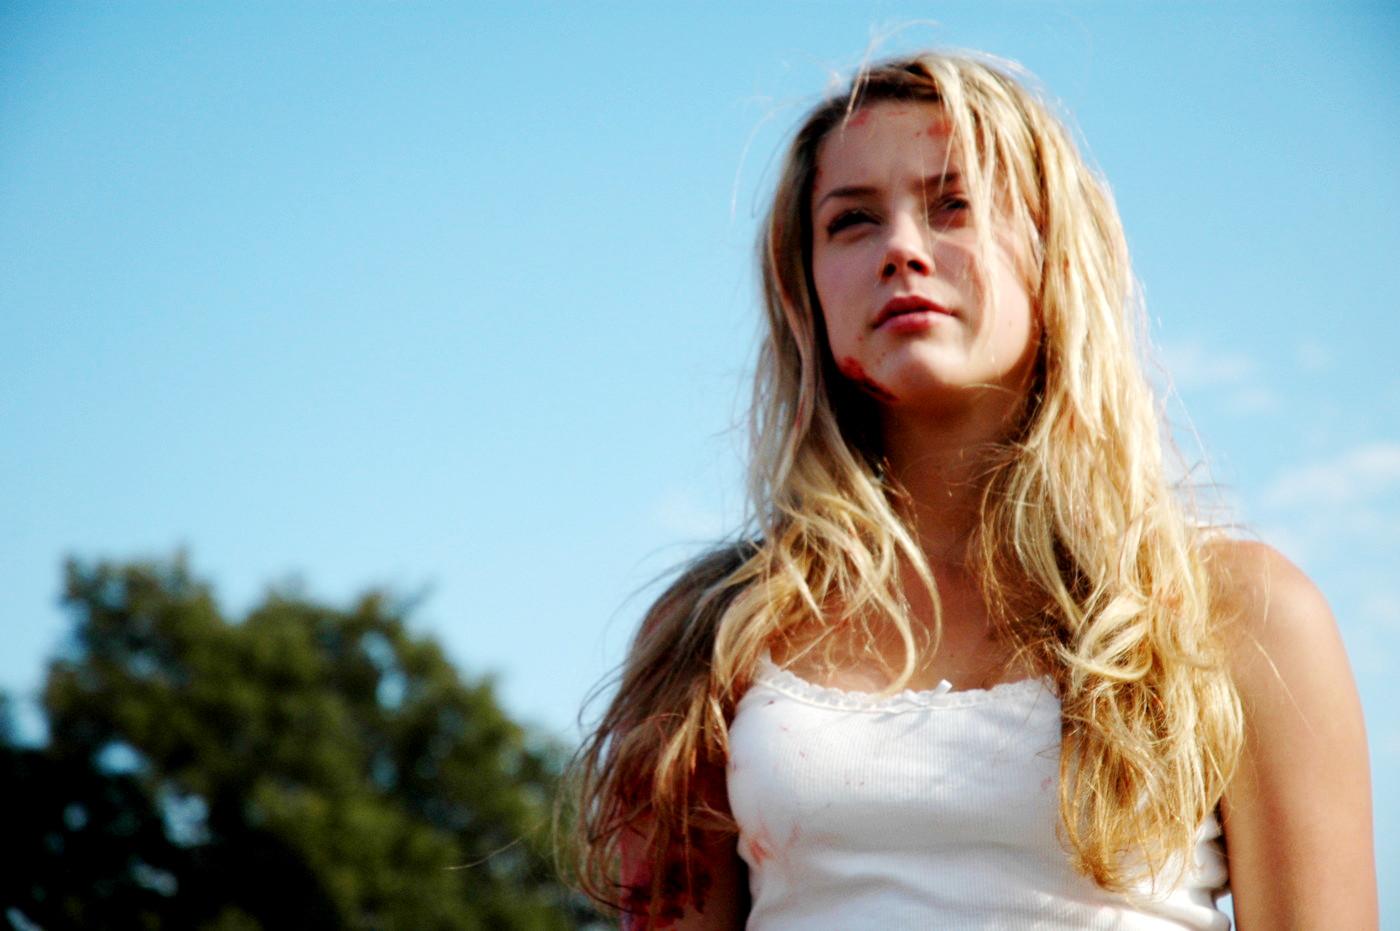 Amber Heard All the Boys Love Mandy Lane